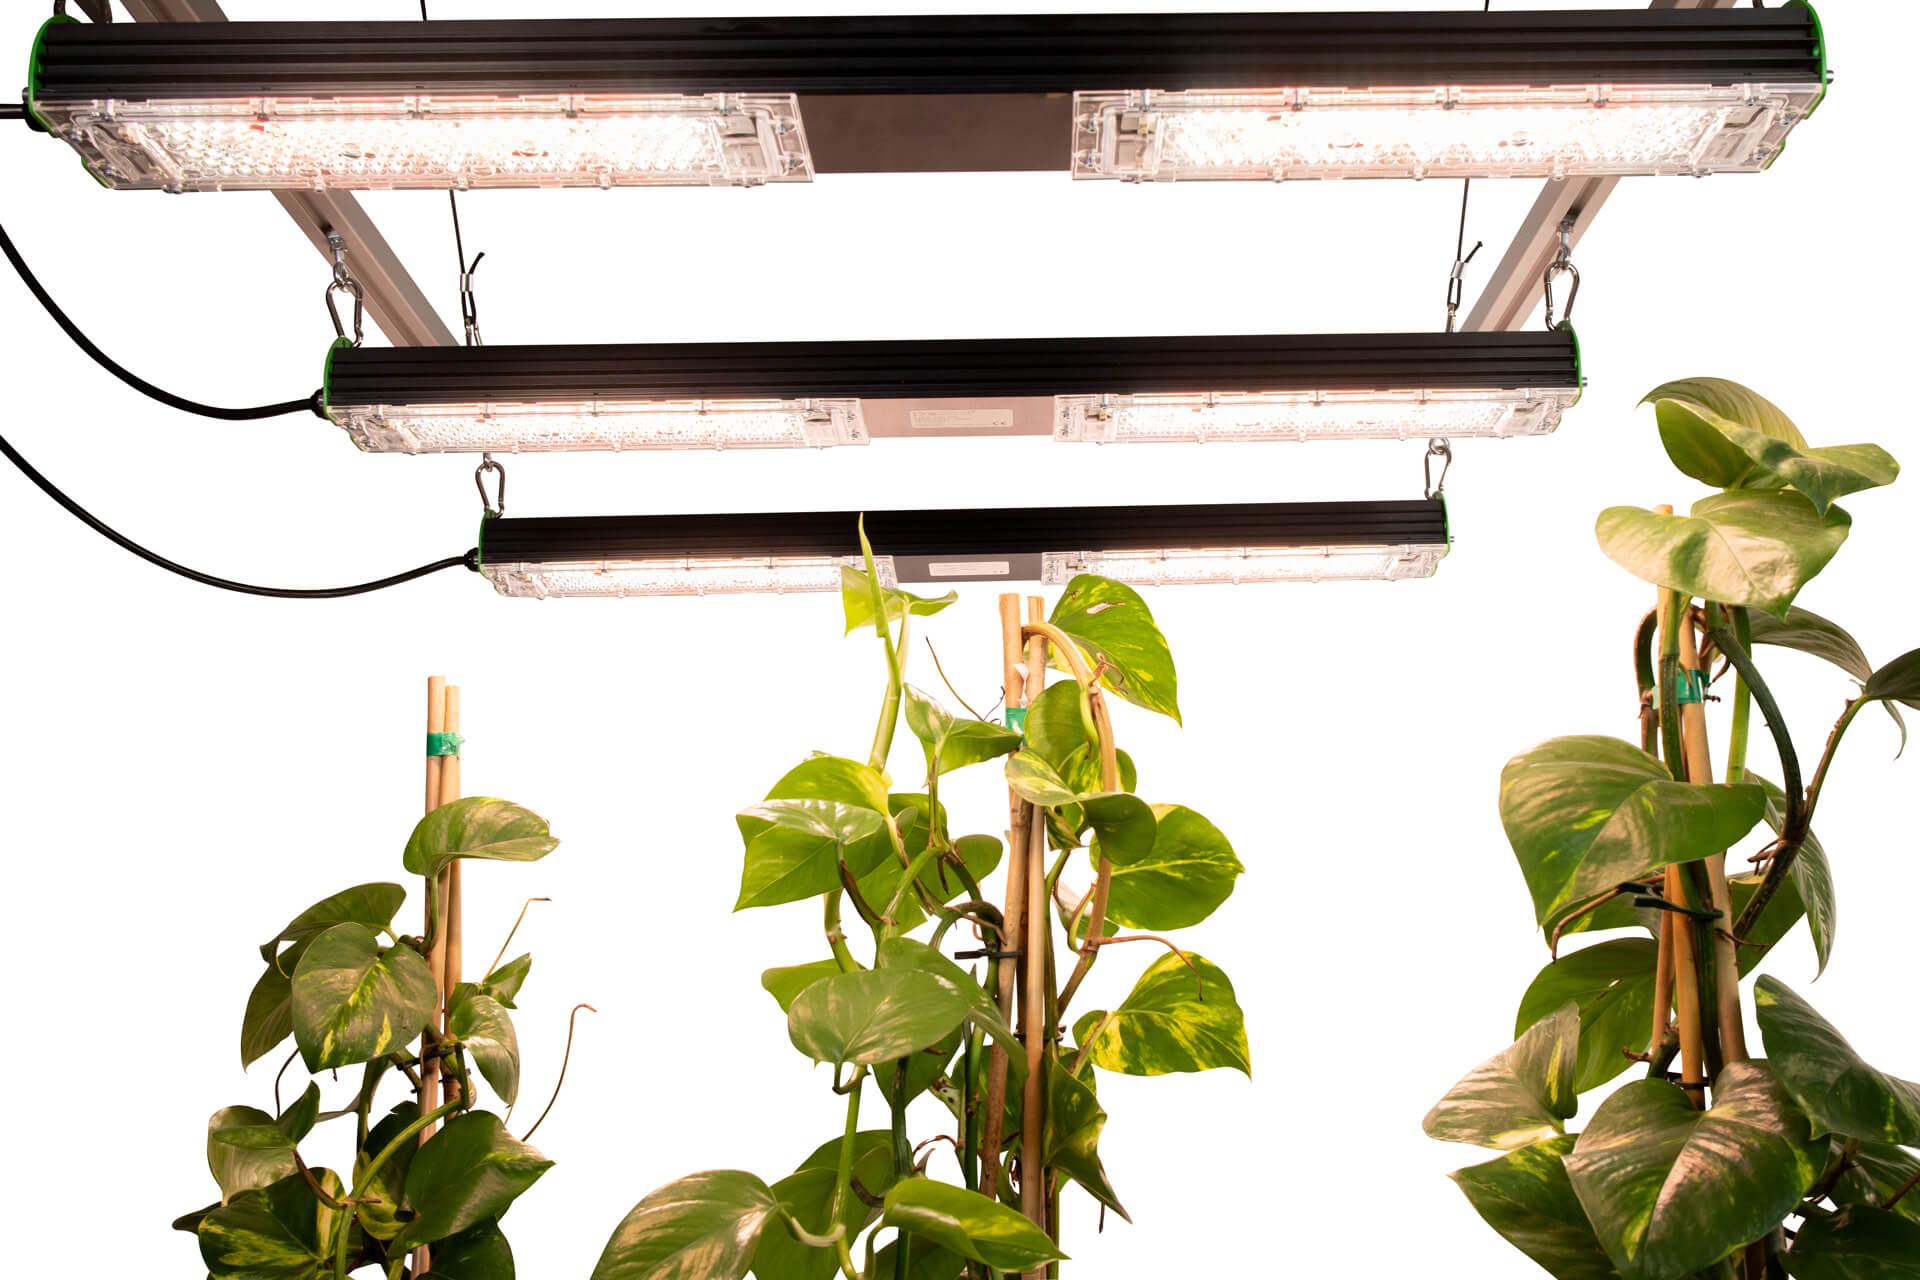 sunbar-360-b-pro-emit-bottum-up-on-plants